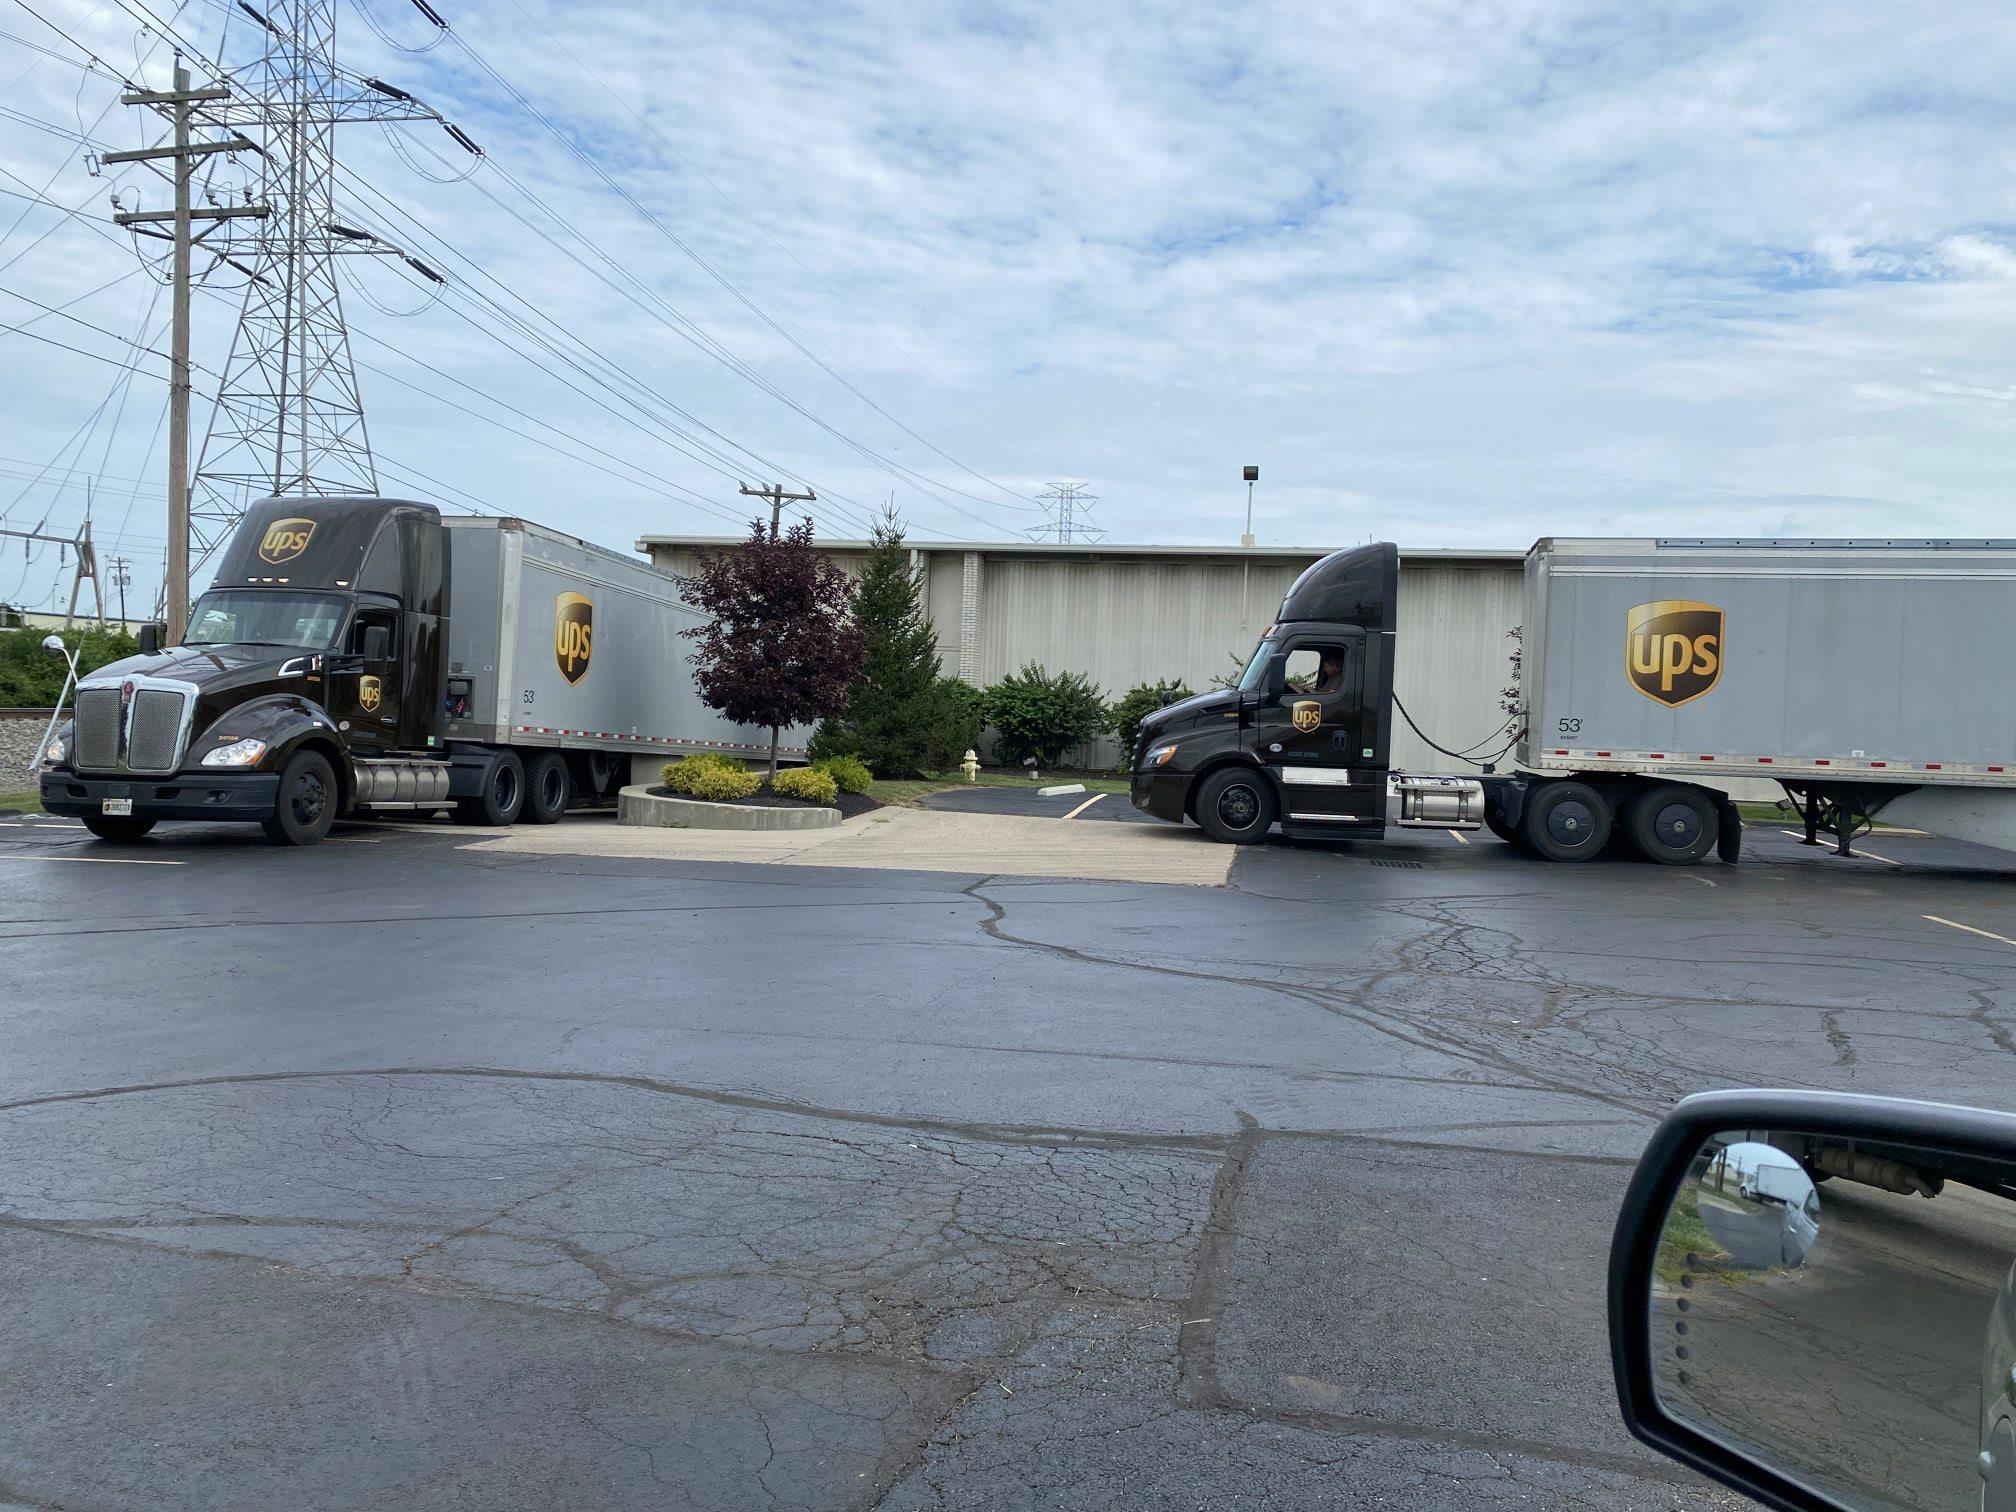 Loading UPS trucks with supplies in Cincinnati, OH